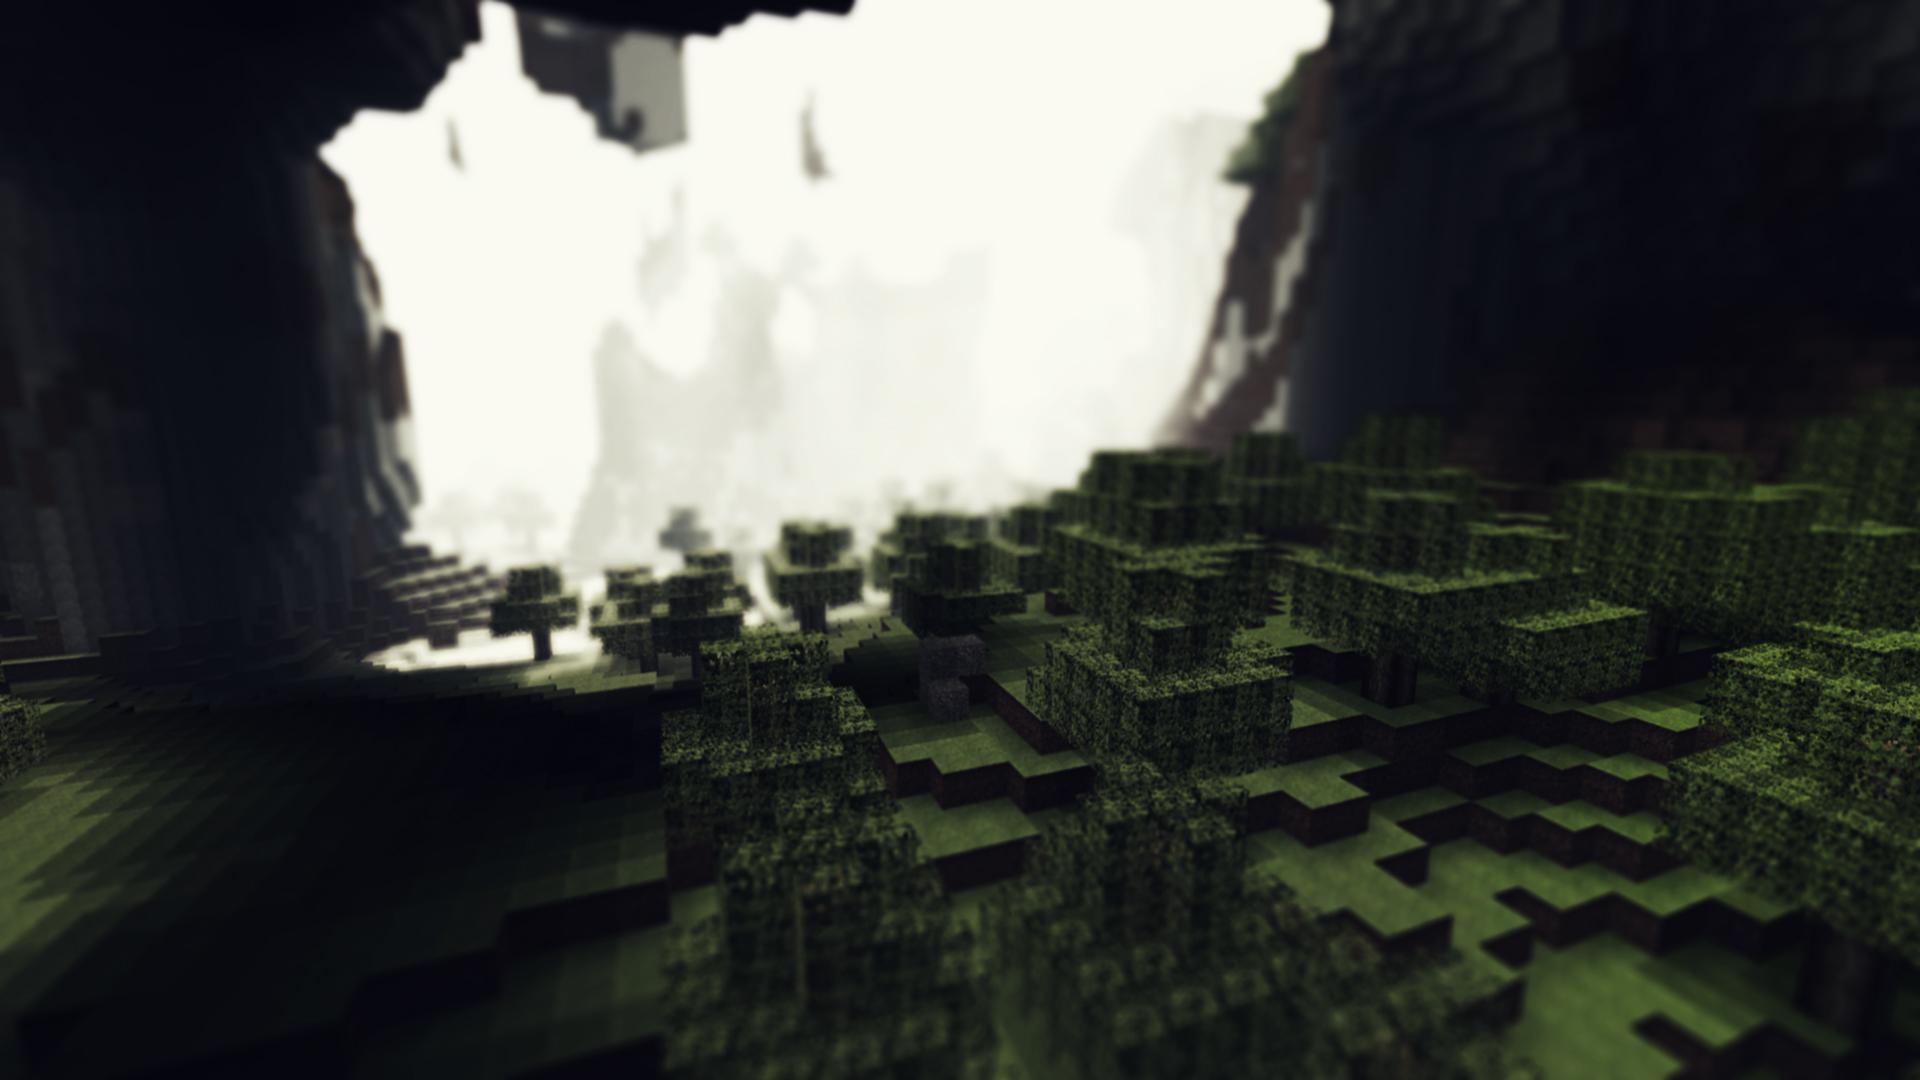 Novaskin-minecraft-wallpaper by Art-Pz on DeviantArt